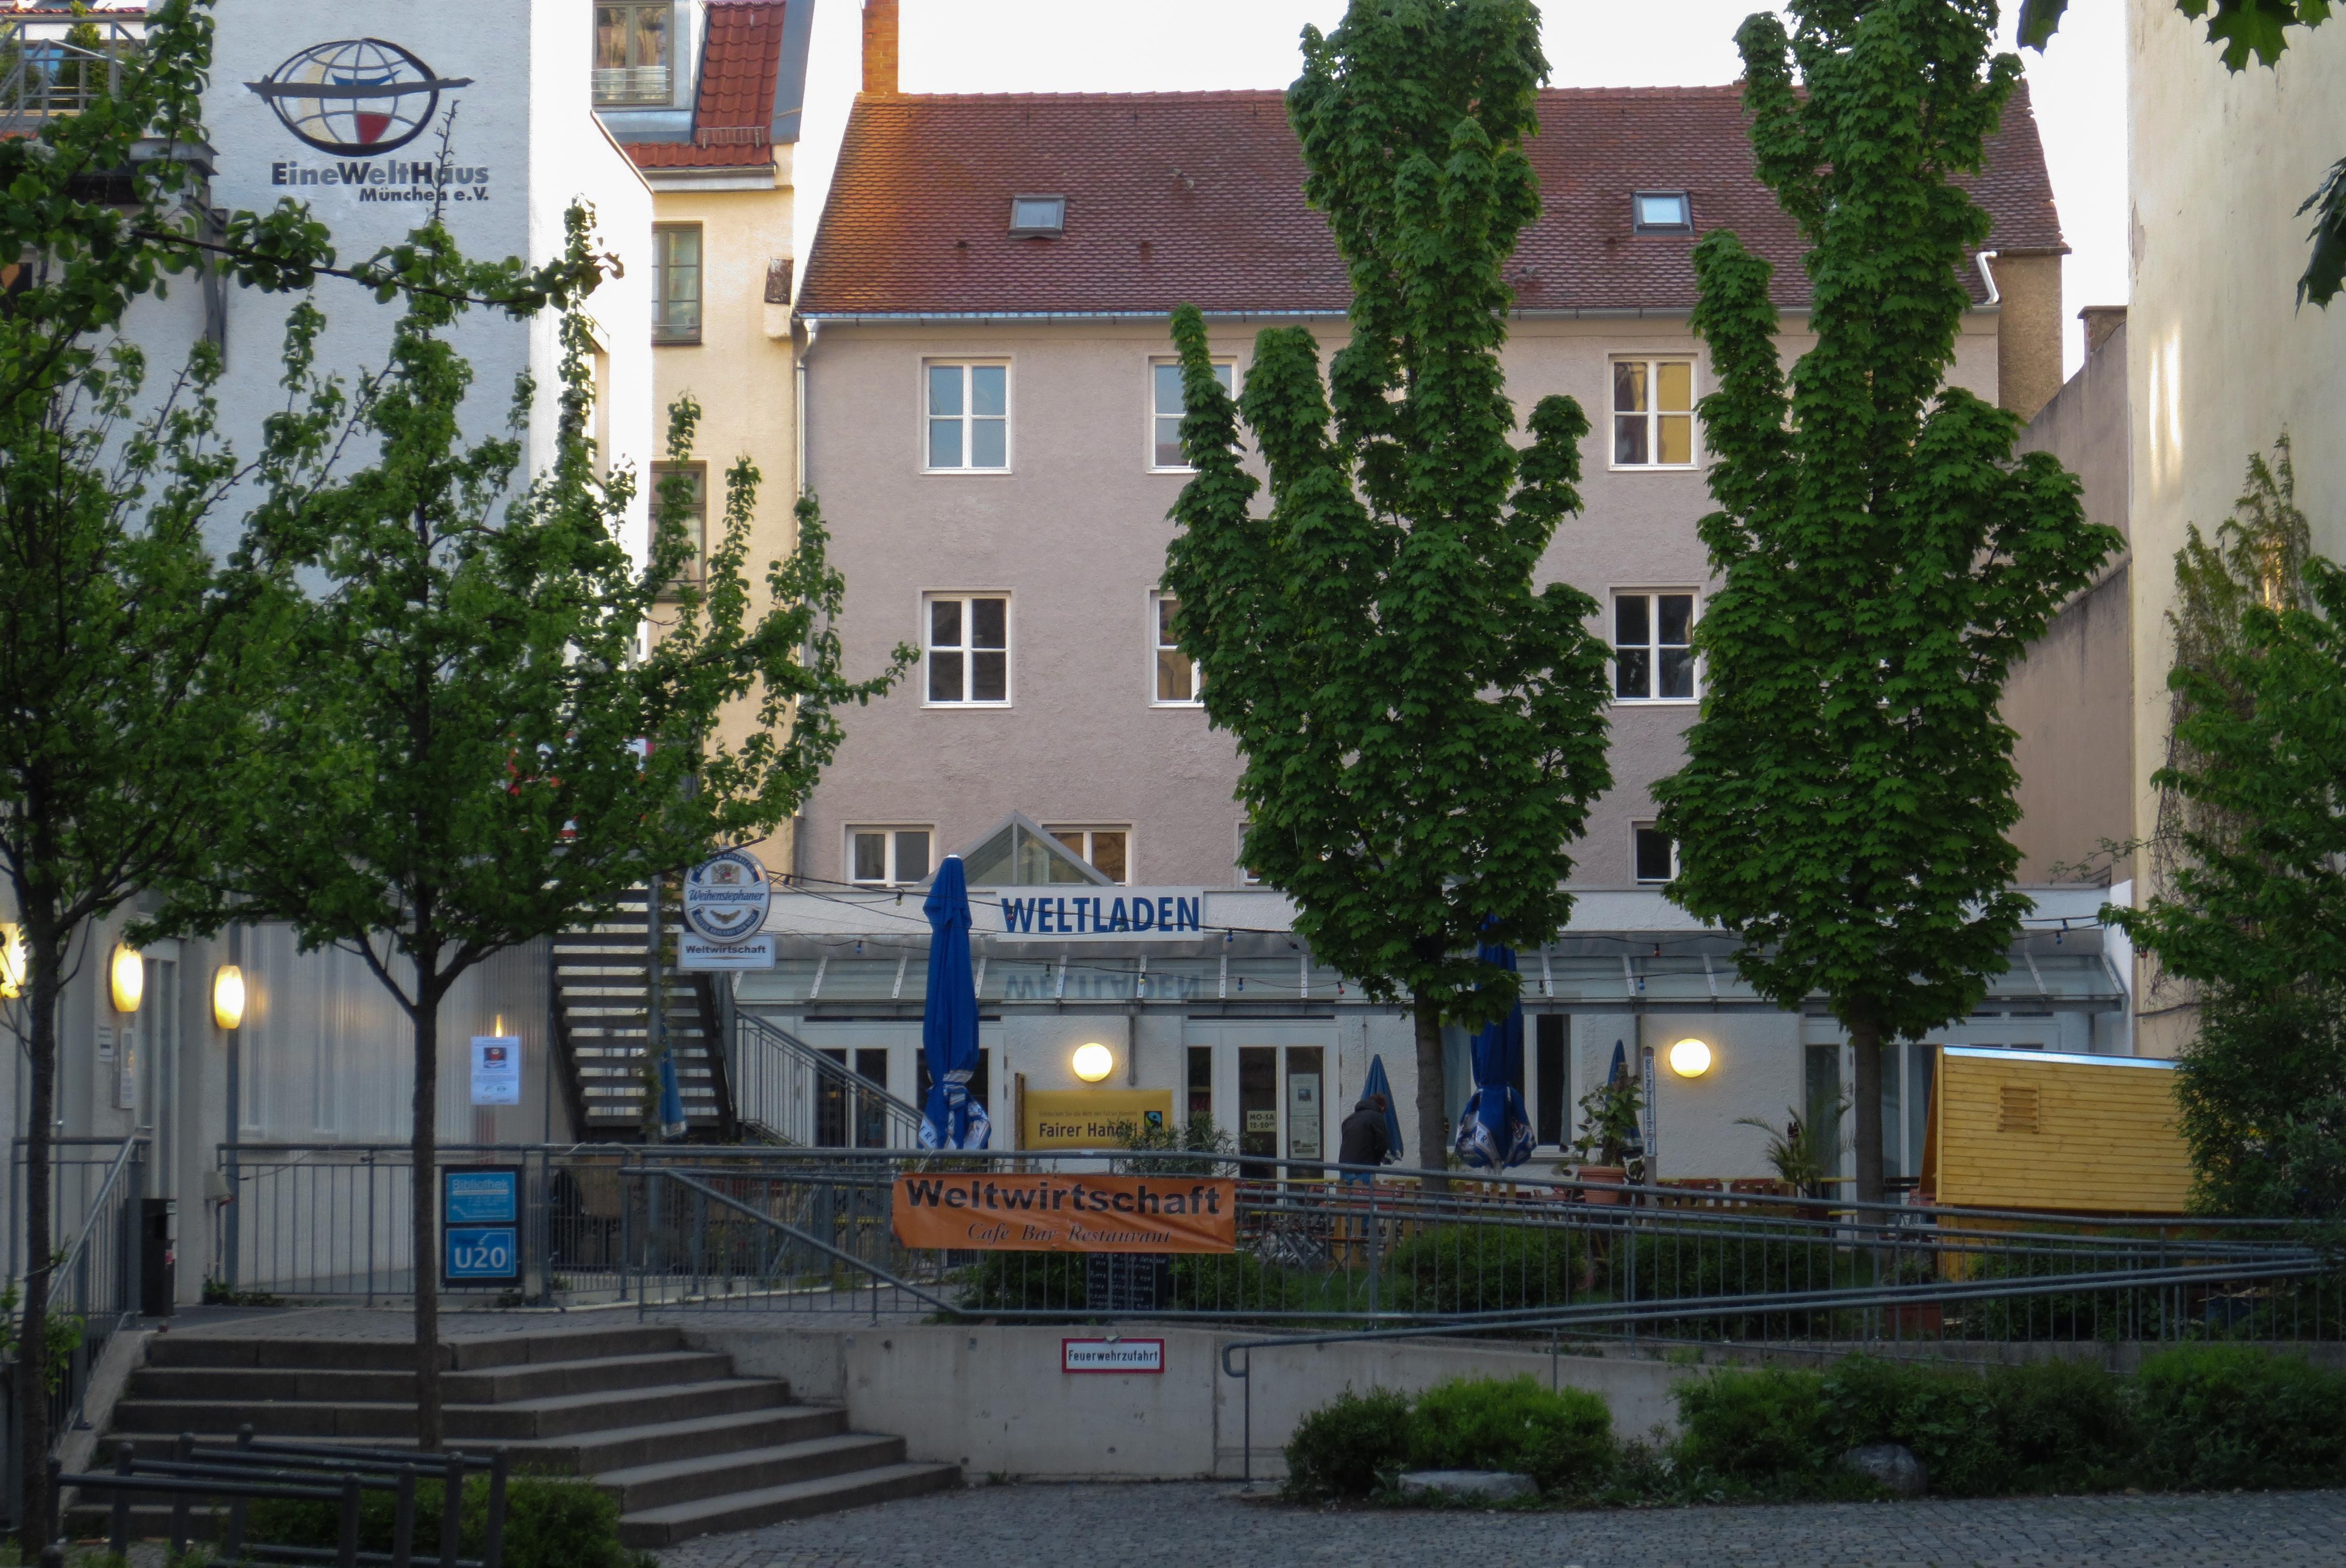 File:Eine Welt Haus München 009.jpg - Wikimedia Commons size: 4395 x 2938 post ID: 7 File size: 0 B